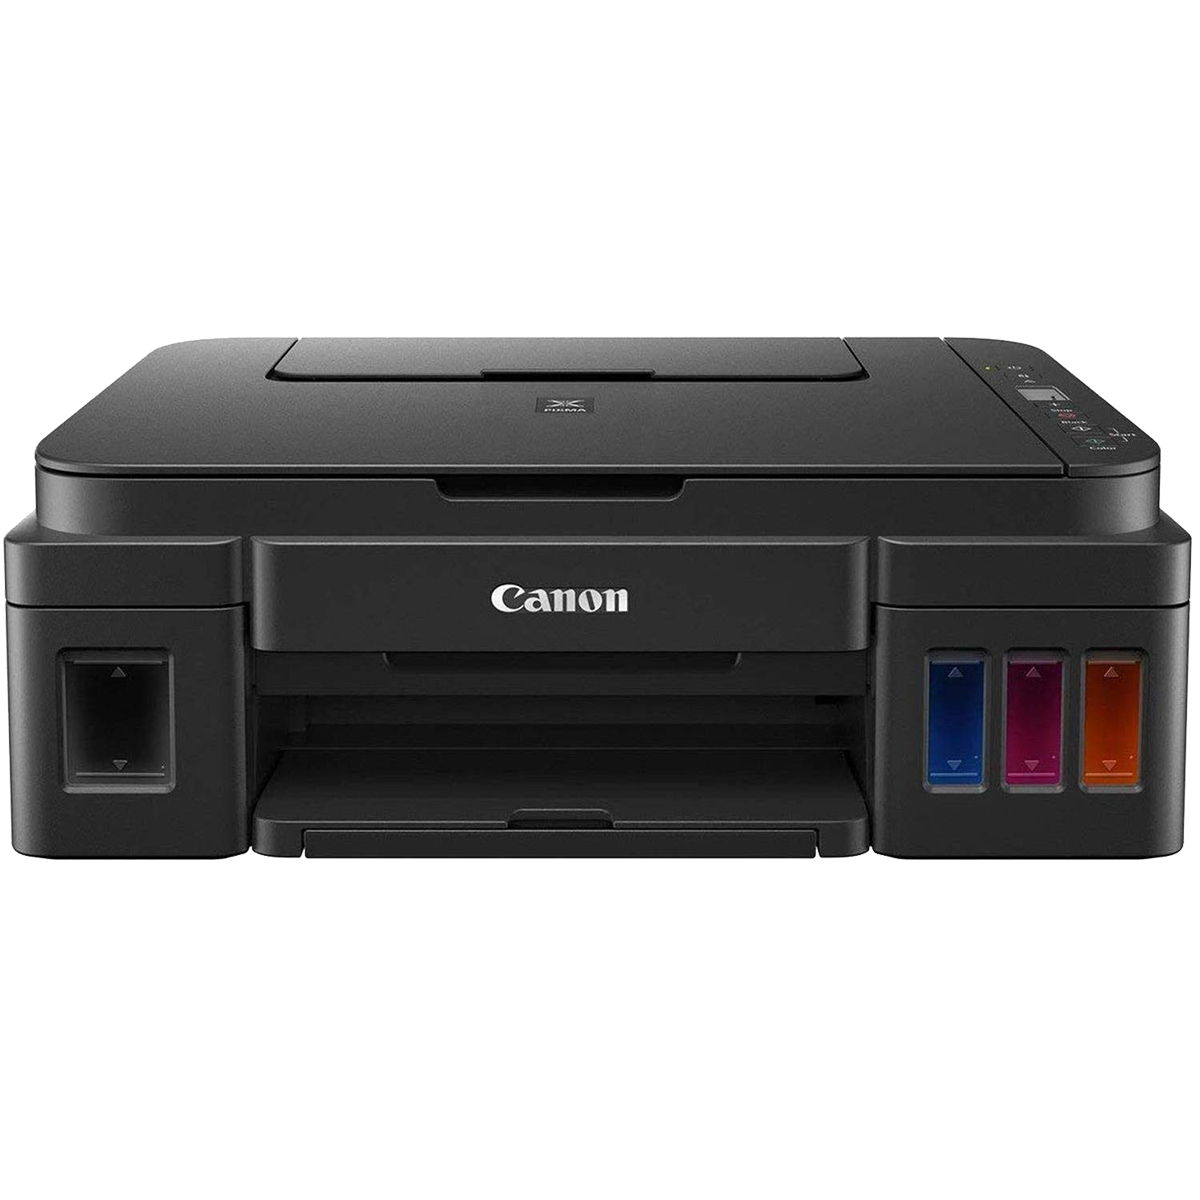 Canon Pixma All-in-One Ink Tank Printer (G2010, Black)_1